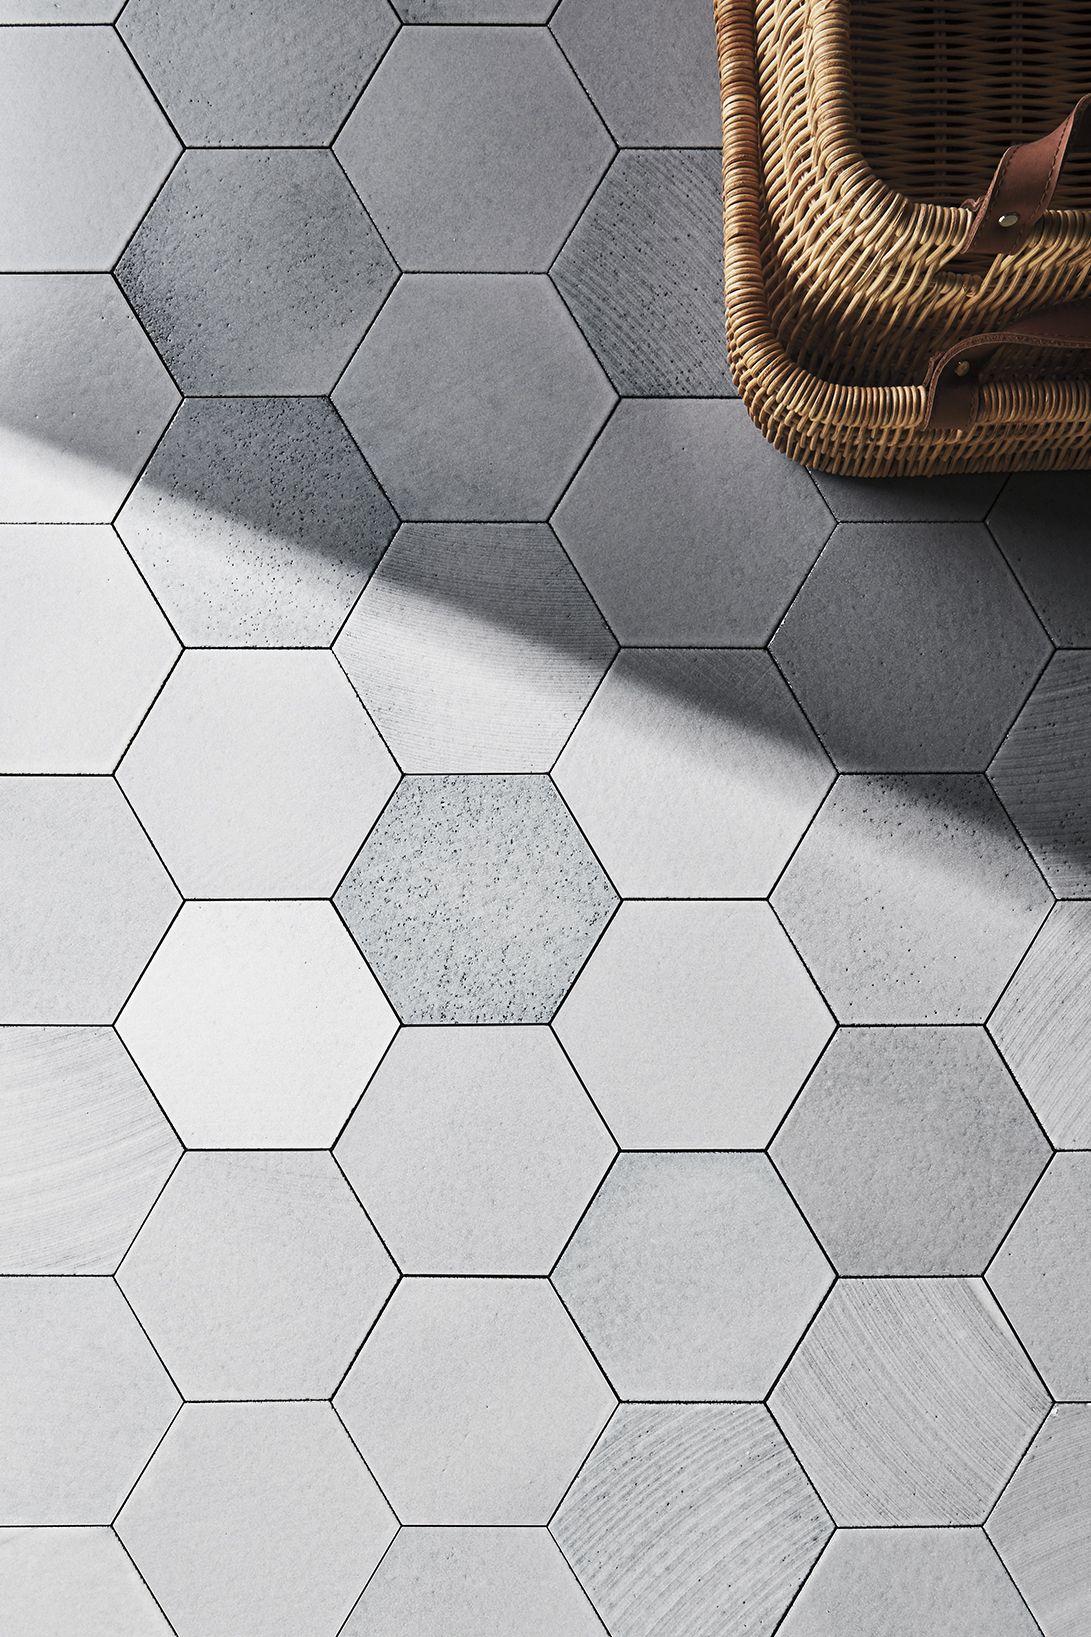 Magma 3 Hexagon Mosaic Hexagonal Mosaic Hexagon Mosaic Tile